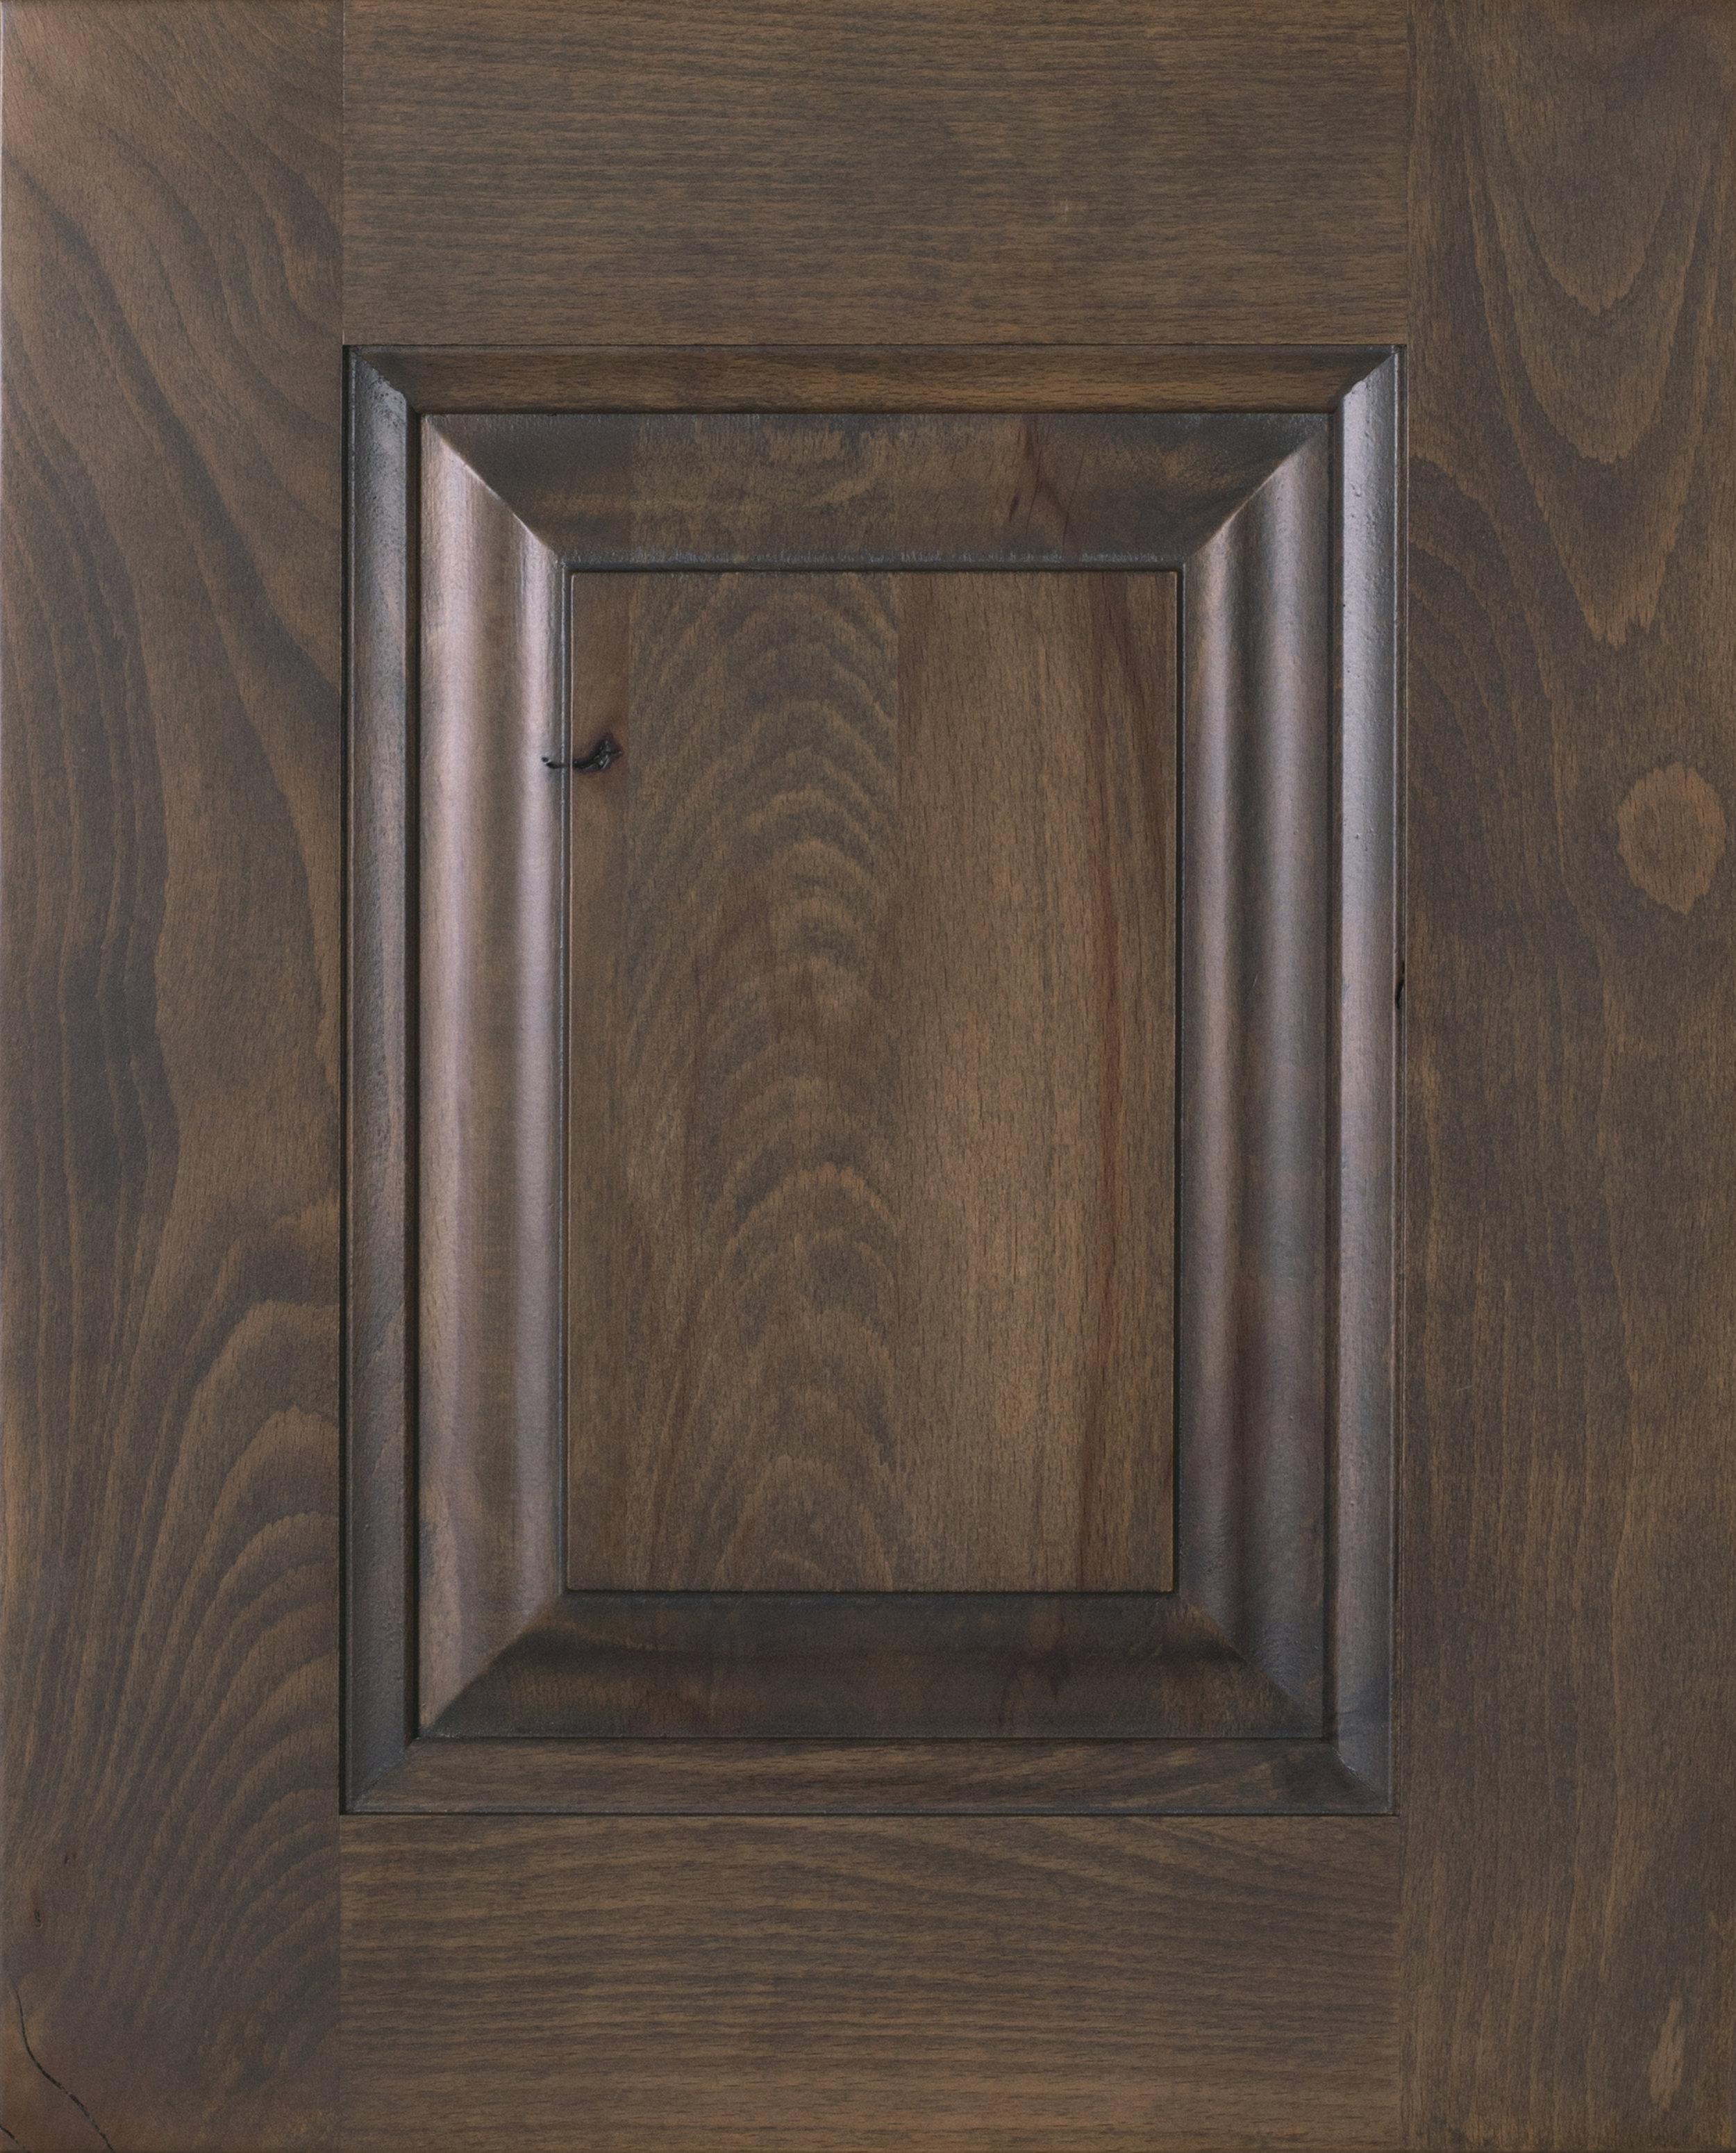 Sequoia - Raised Center PanelCherry | Maple | Paint | Rustic BeechShown in Rustic Beech Driftwood